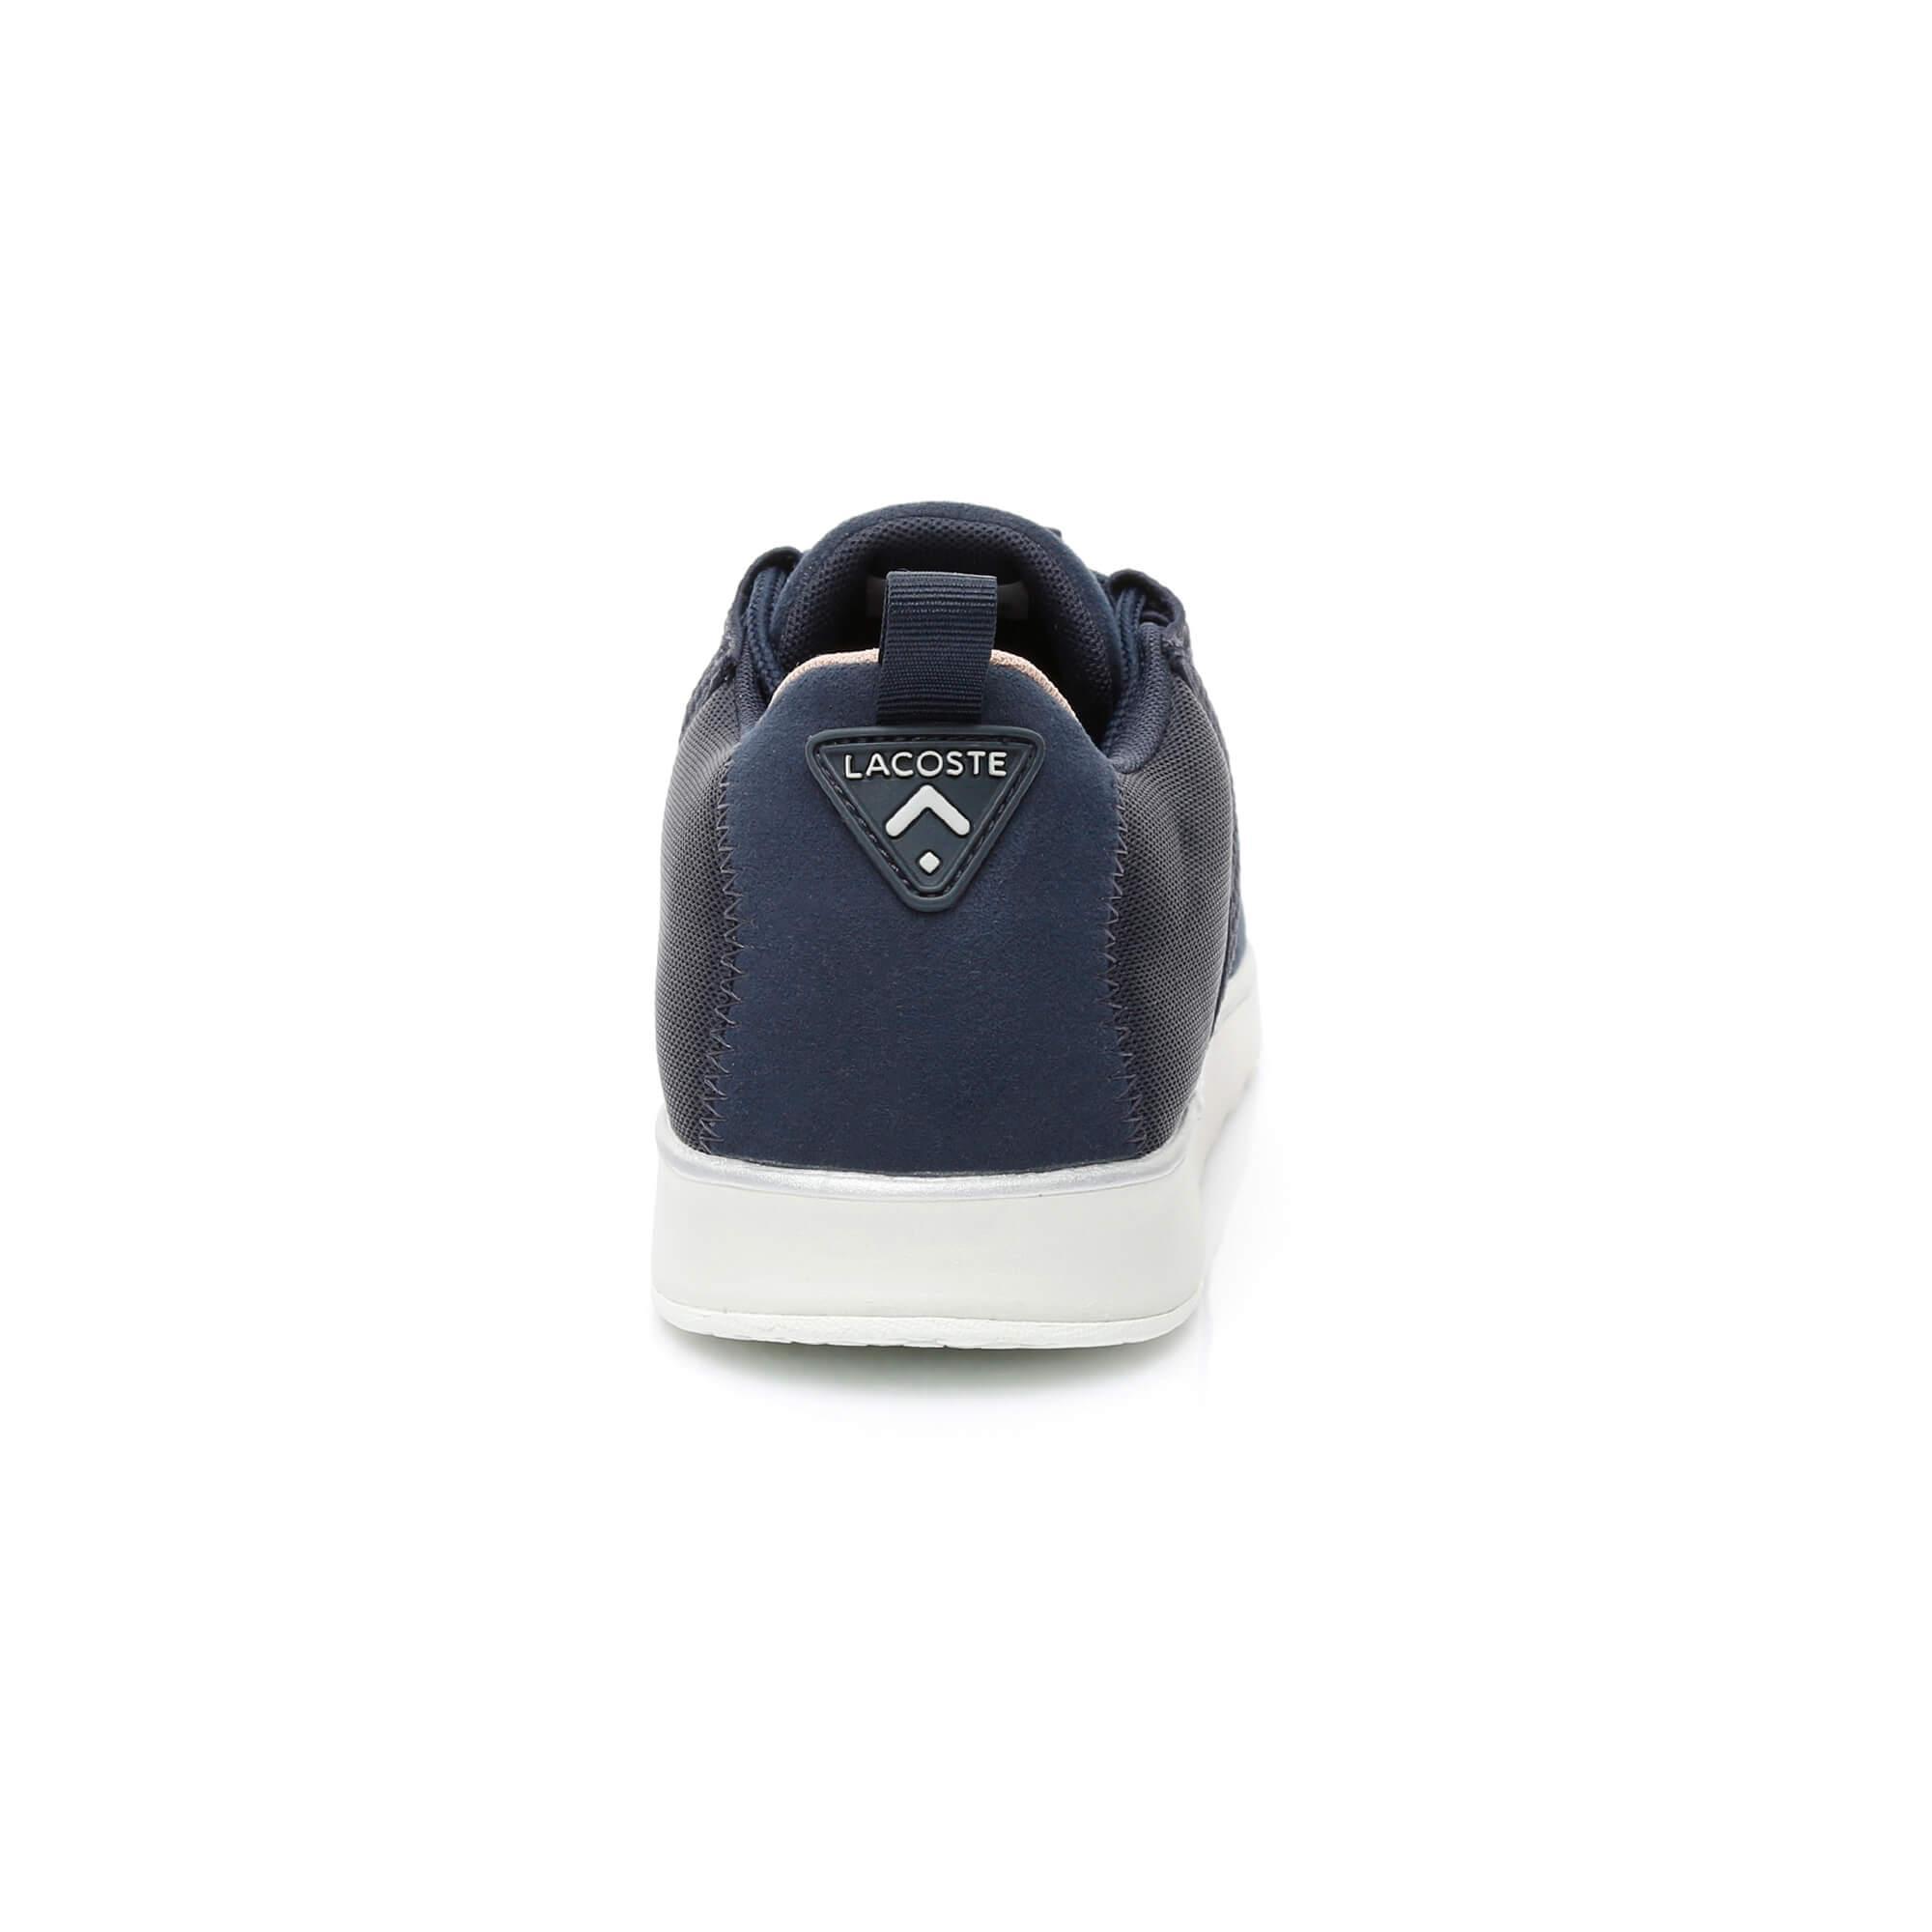 Lacoste L.ight 118 1 Męskie Textile Sneakersy